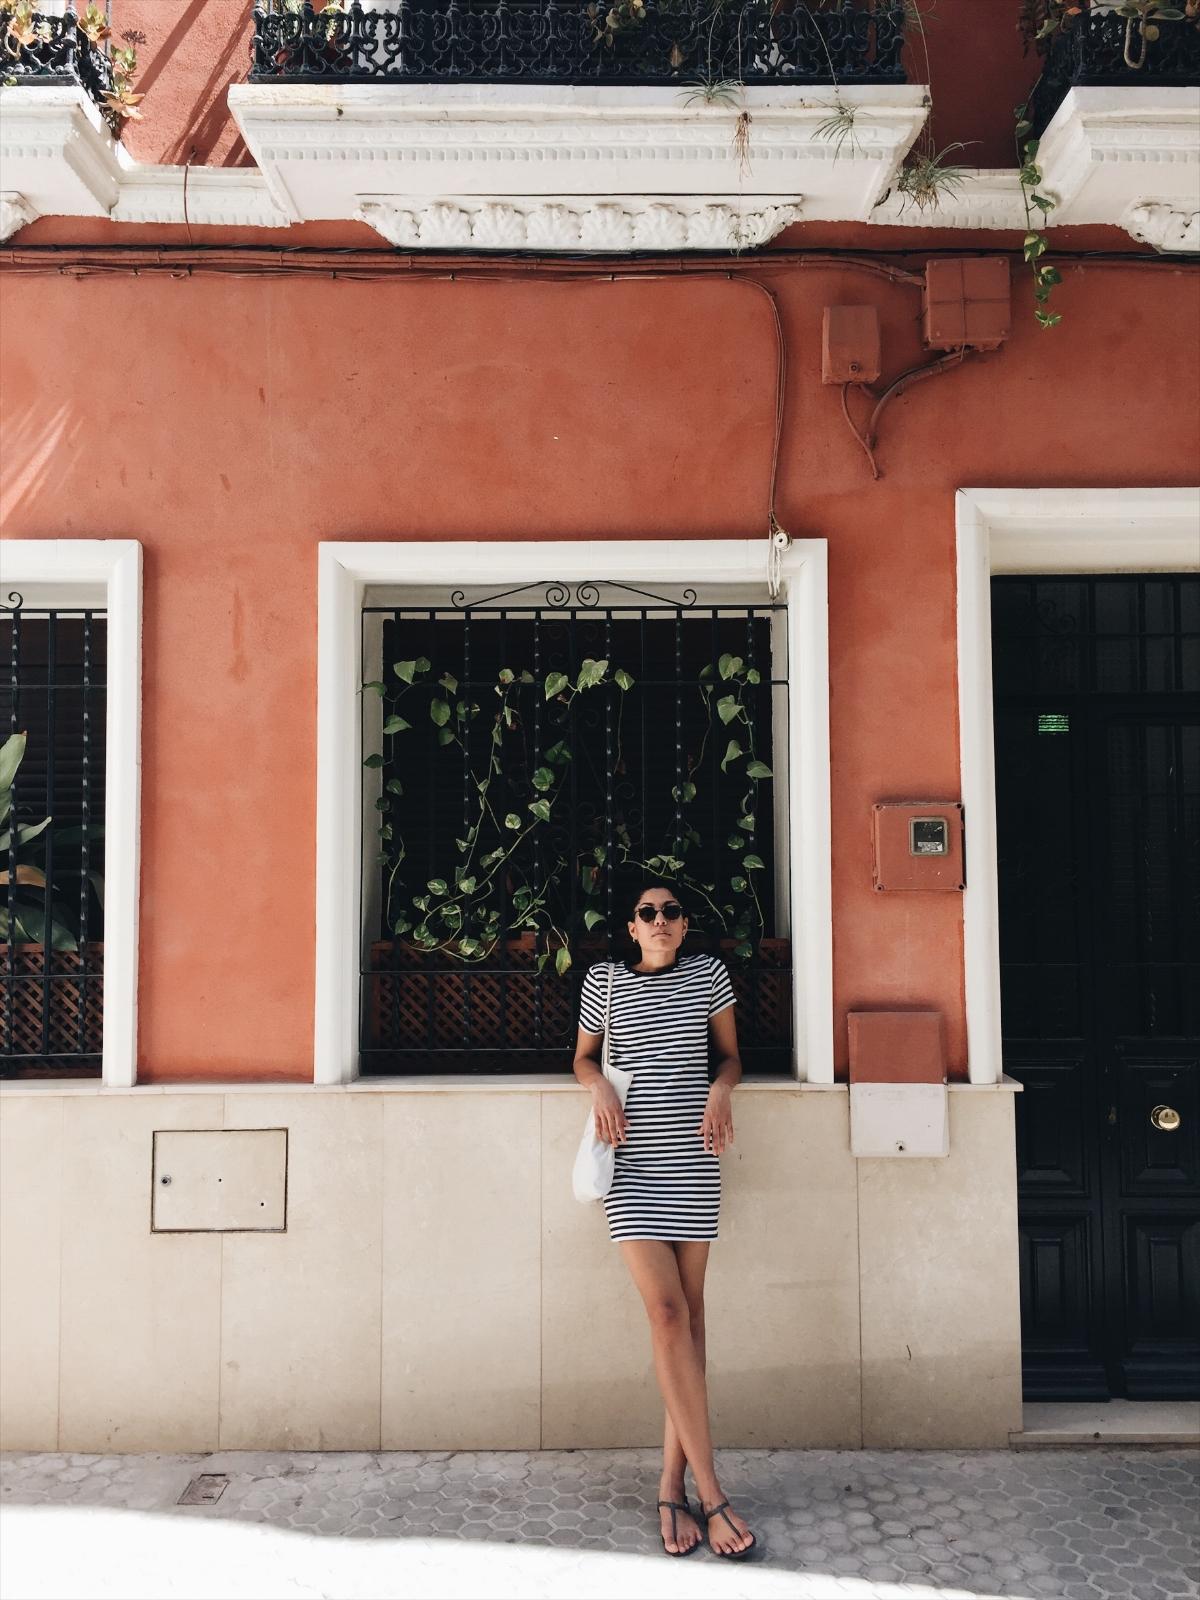 7c2c9-seesoomuch_minimalist_travel_wardrobe_packingseesoomuch_minimalist_travel_wardrobe_packing.jpg